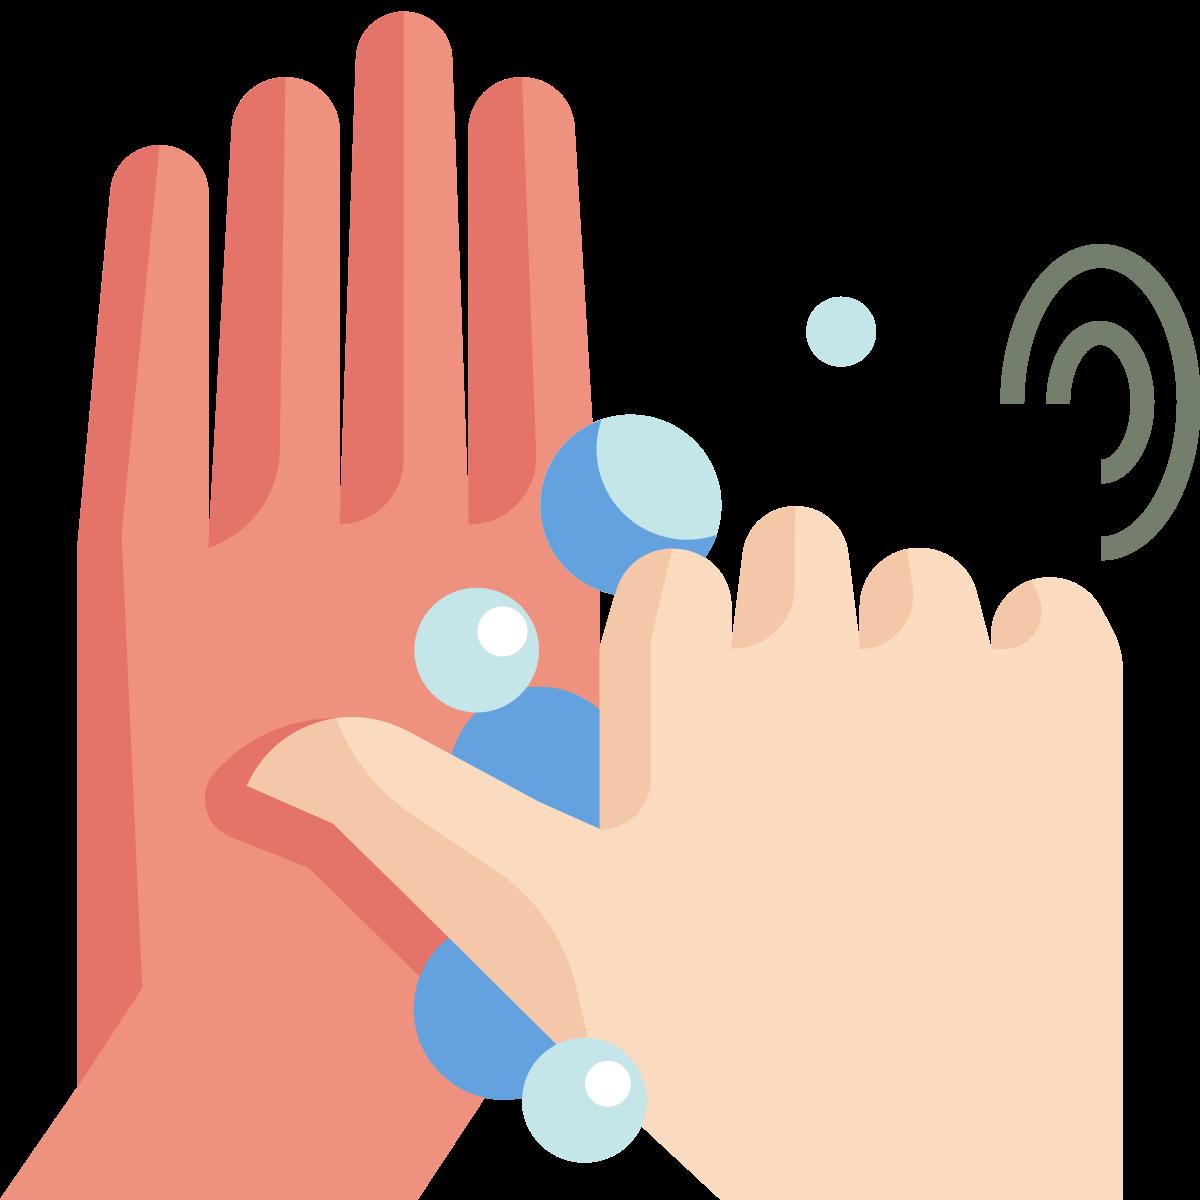 health  coronavirus  sanitized  hands  covid19  wash hands  hygiene icon icon